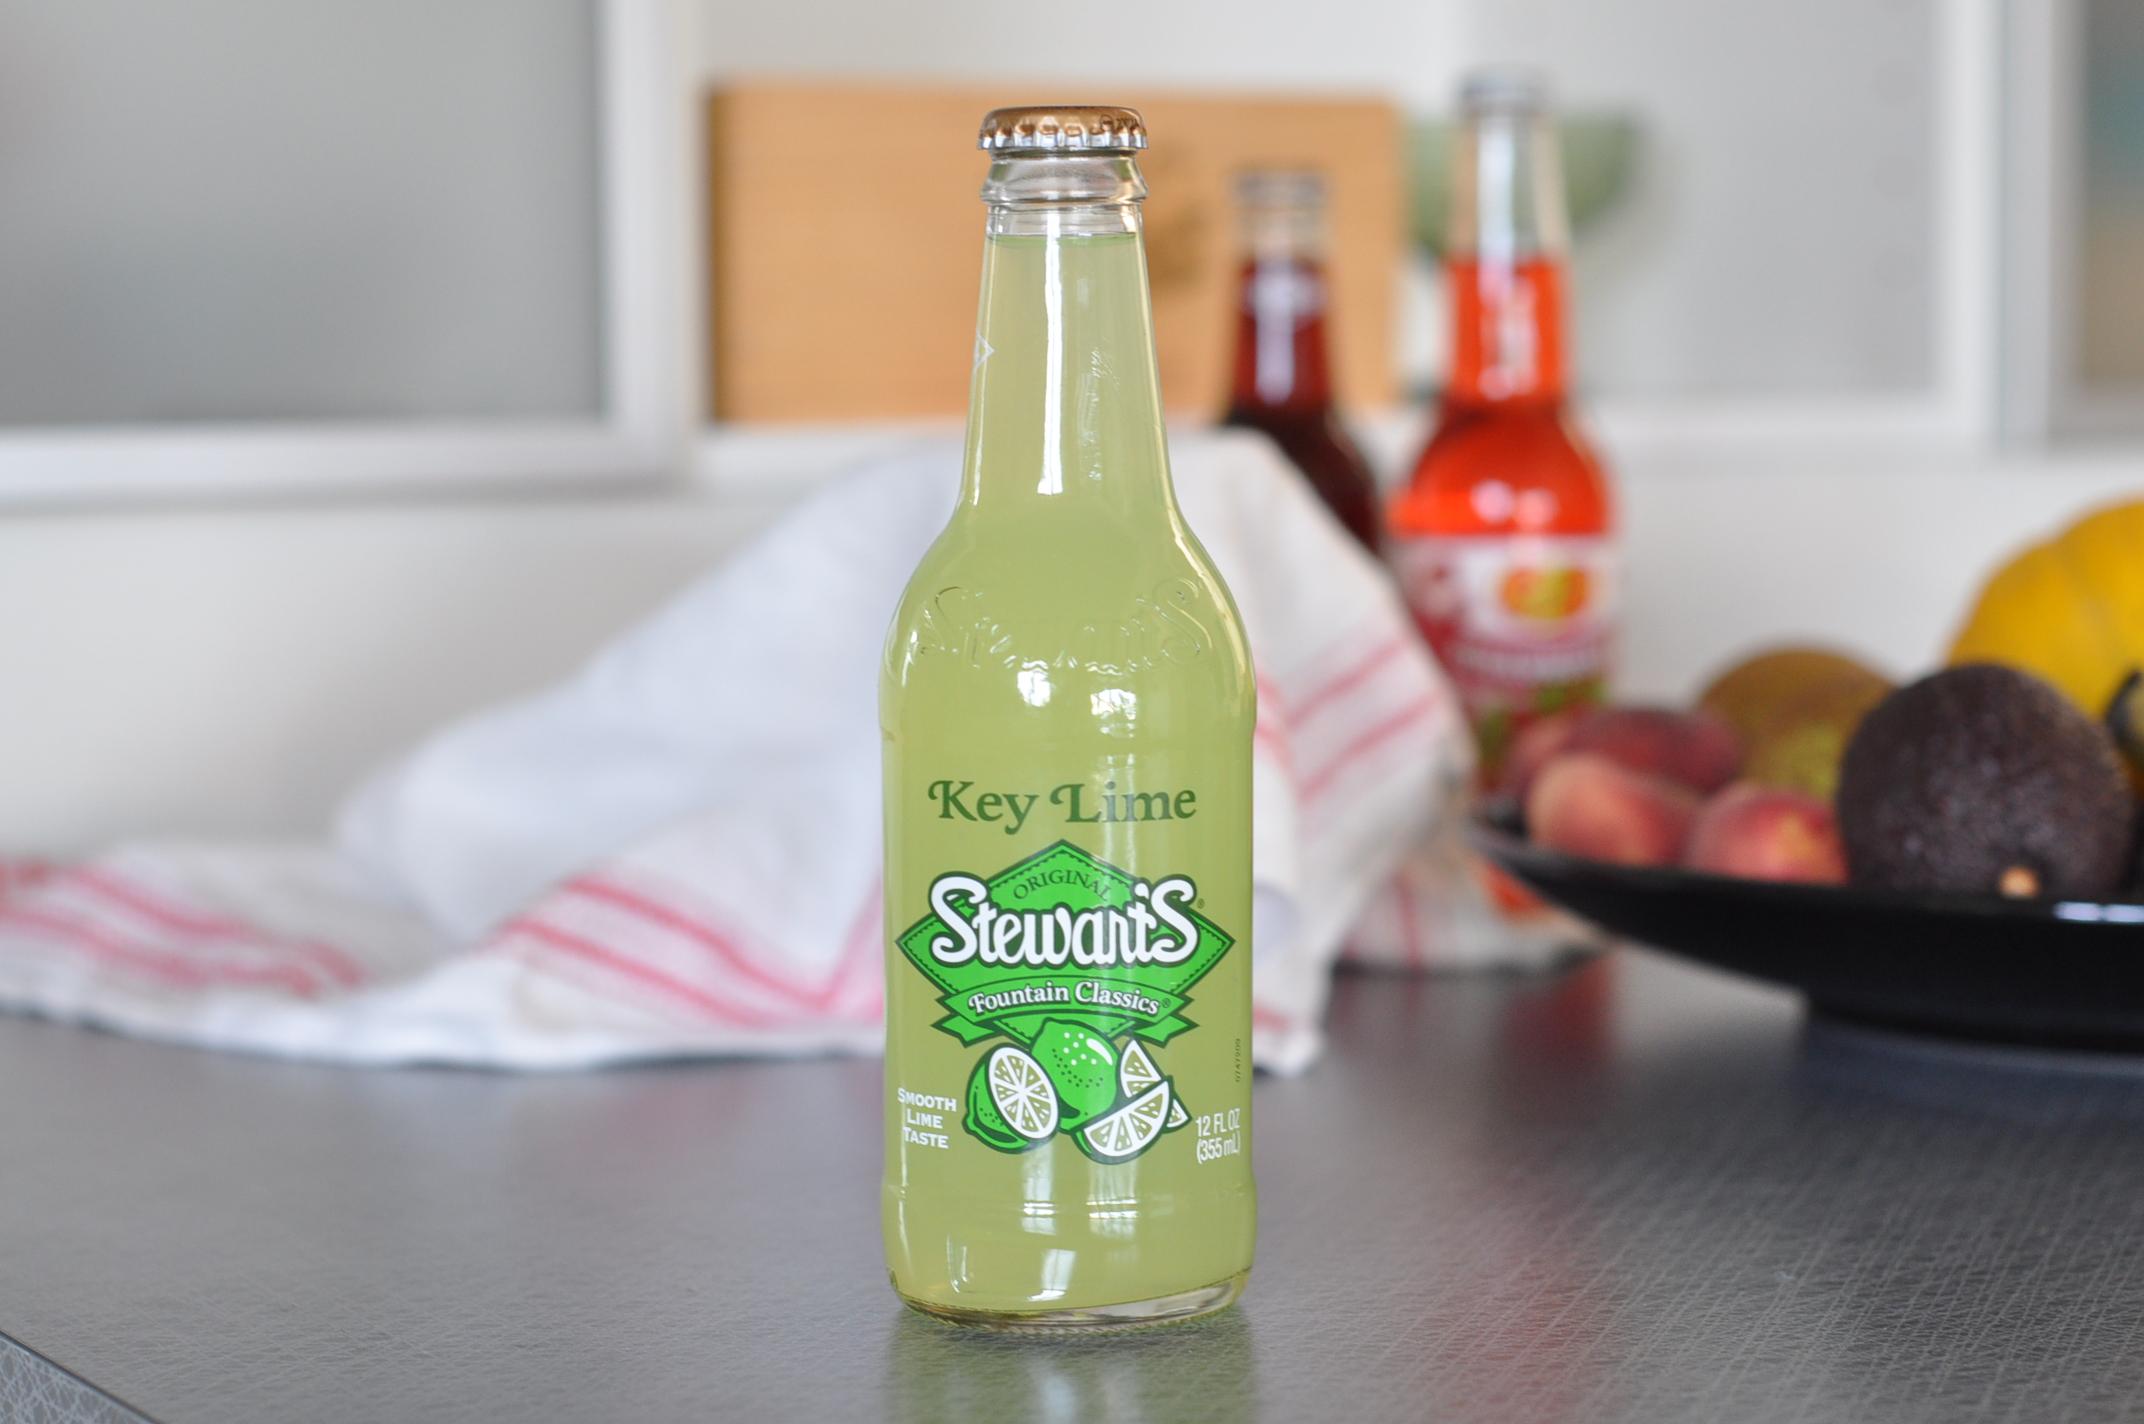 Stewart's Key Lime